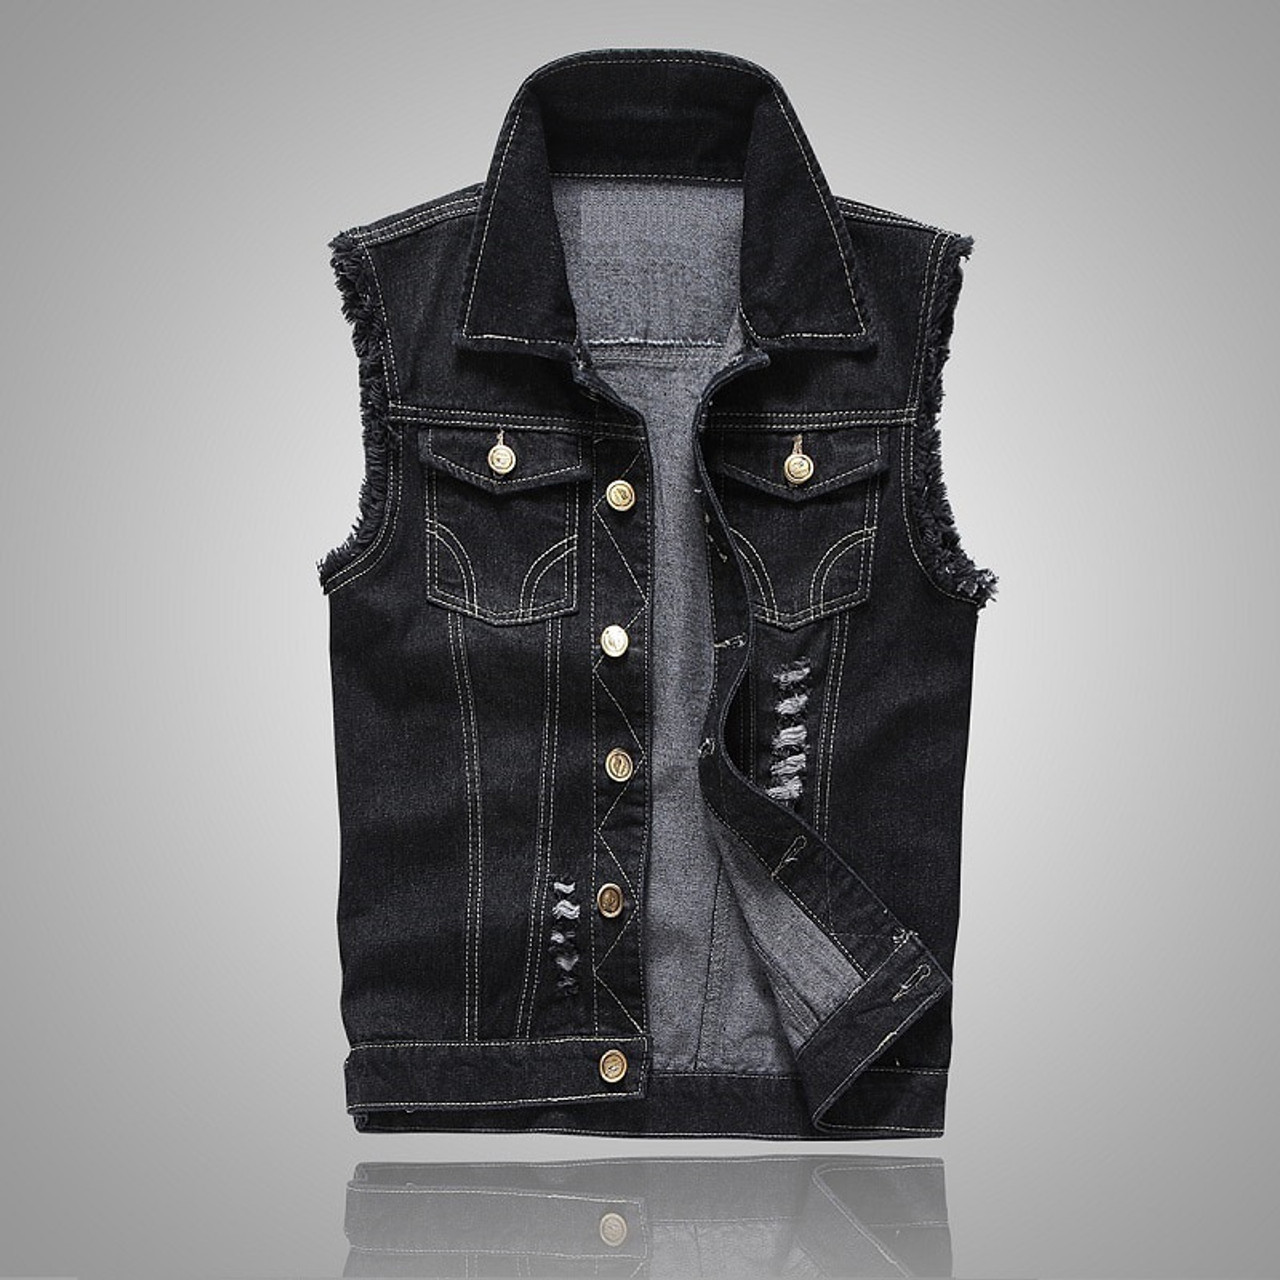 c67a659273b45 ... 2018 Autumn Mens Denim Vest Coat Ripped Tassel Pocket Sleeveless Jean  Jacket Men Casual Cowboy Vest ...